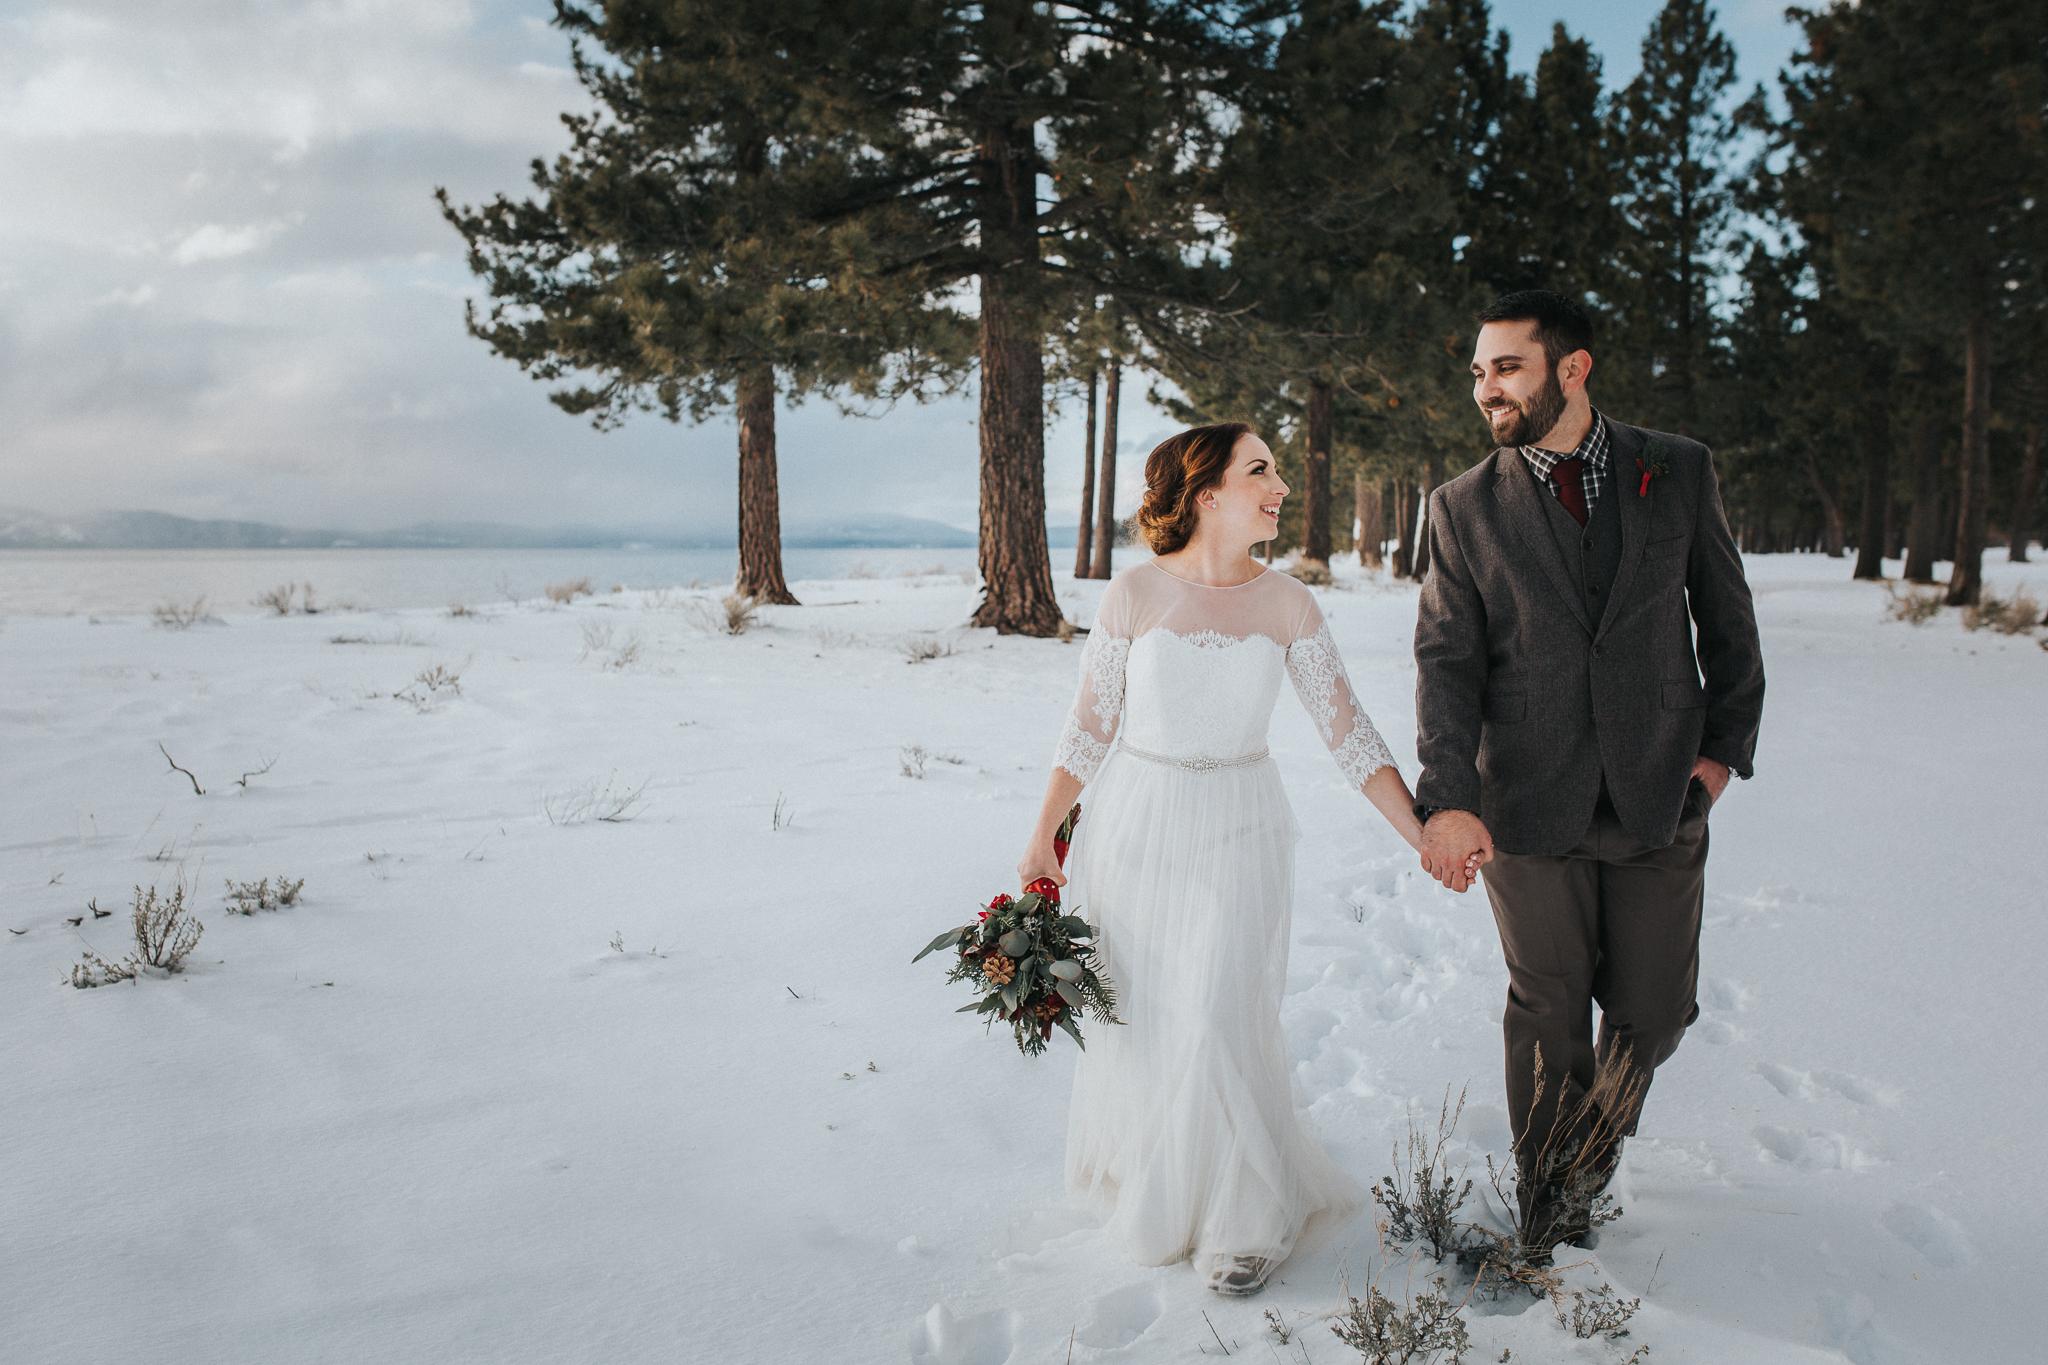 winter-wedding-reno-lake-tahoe-wedding-photographer-16.jpg